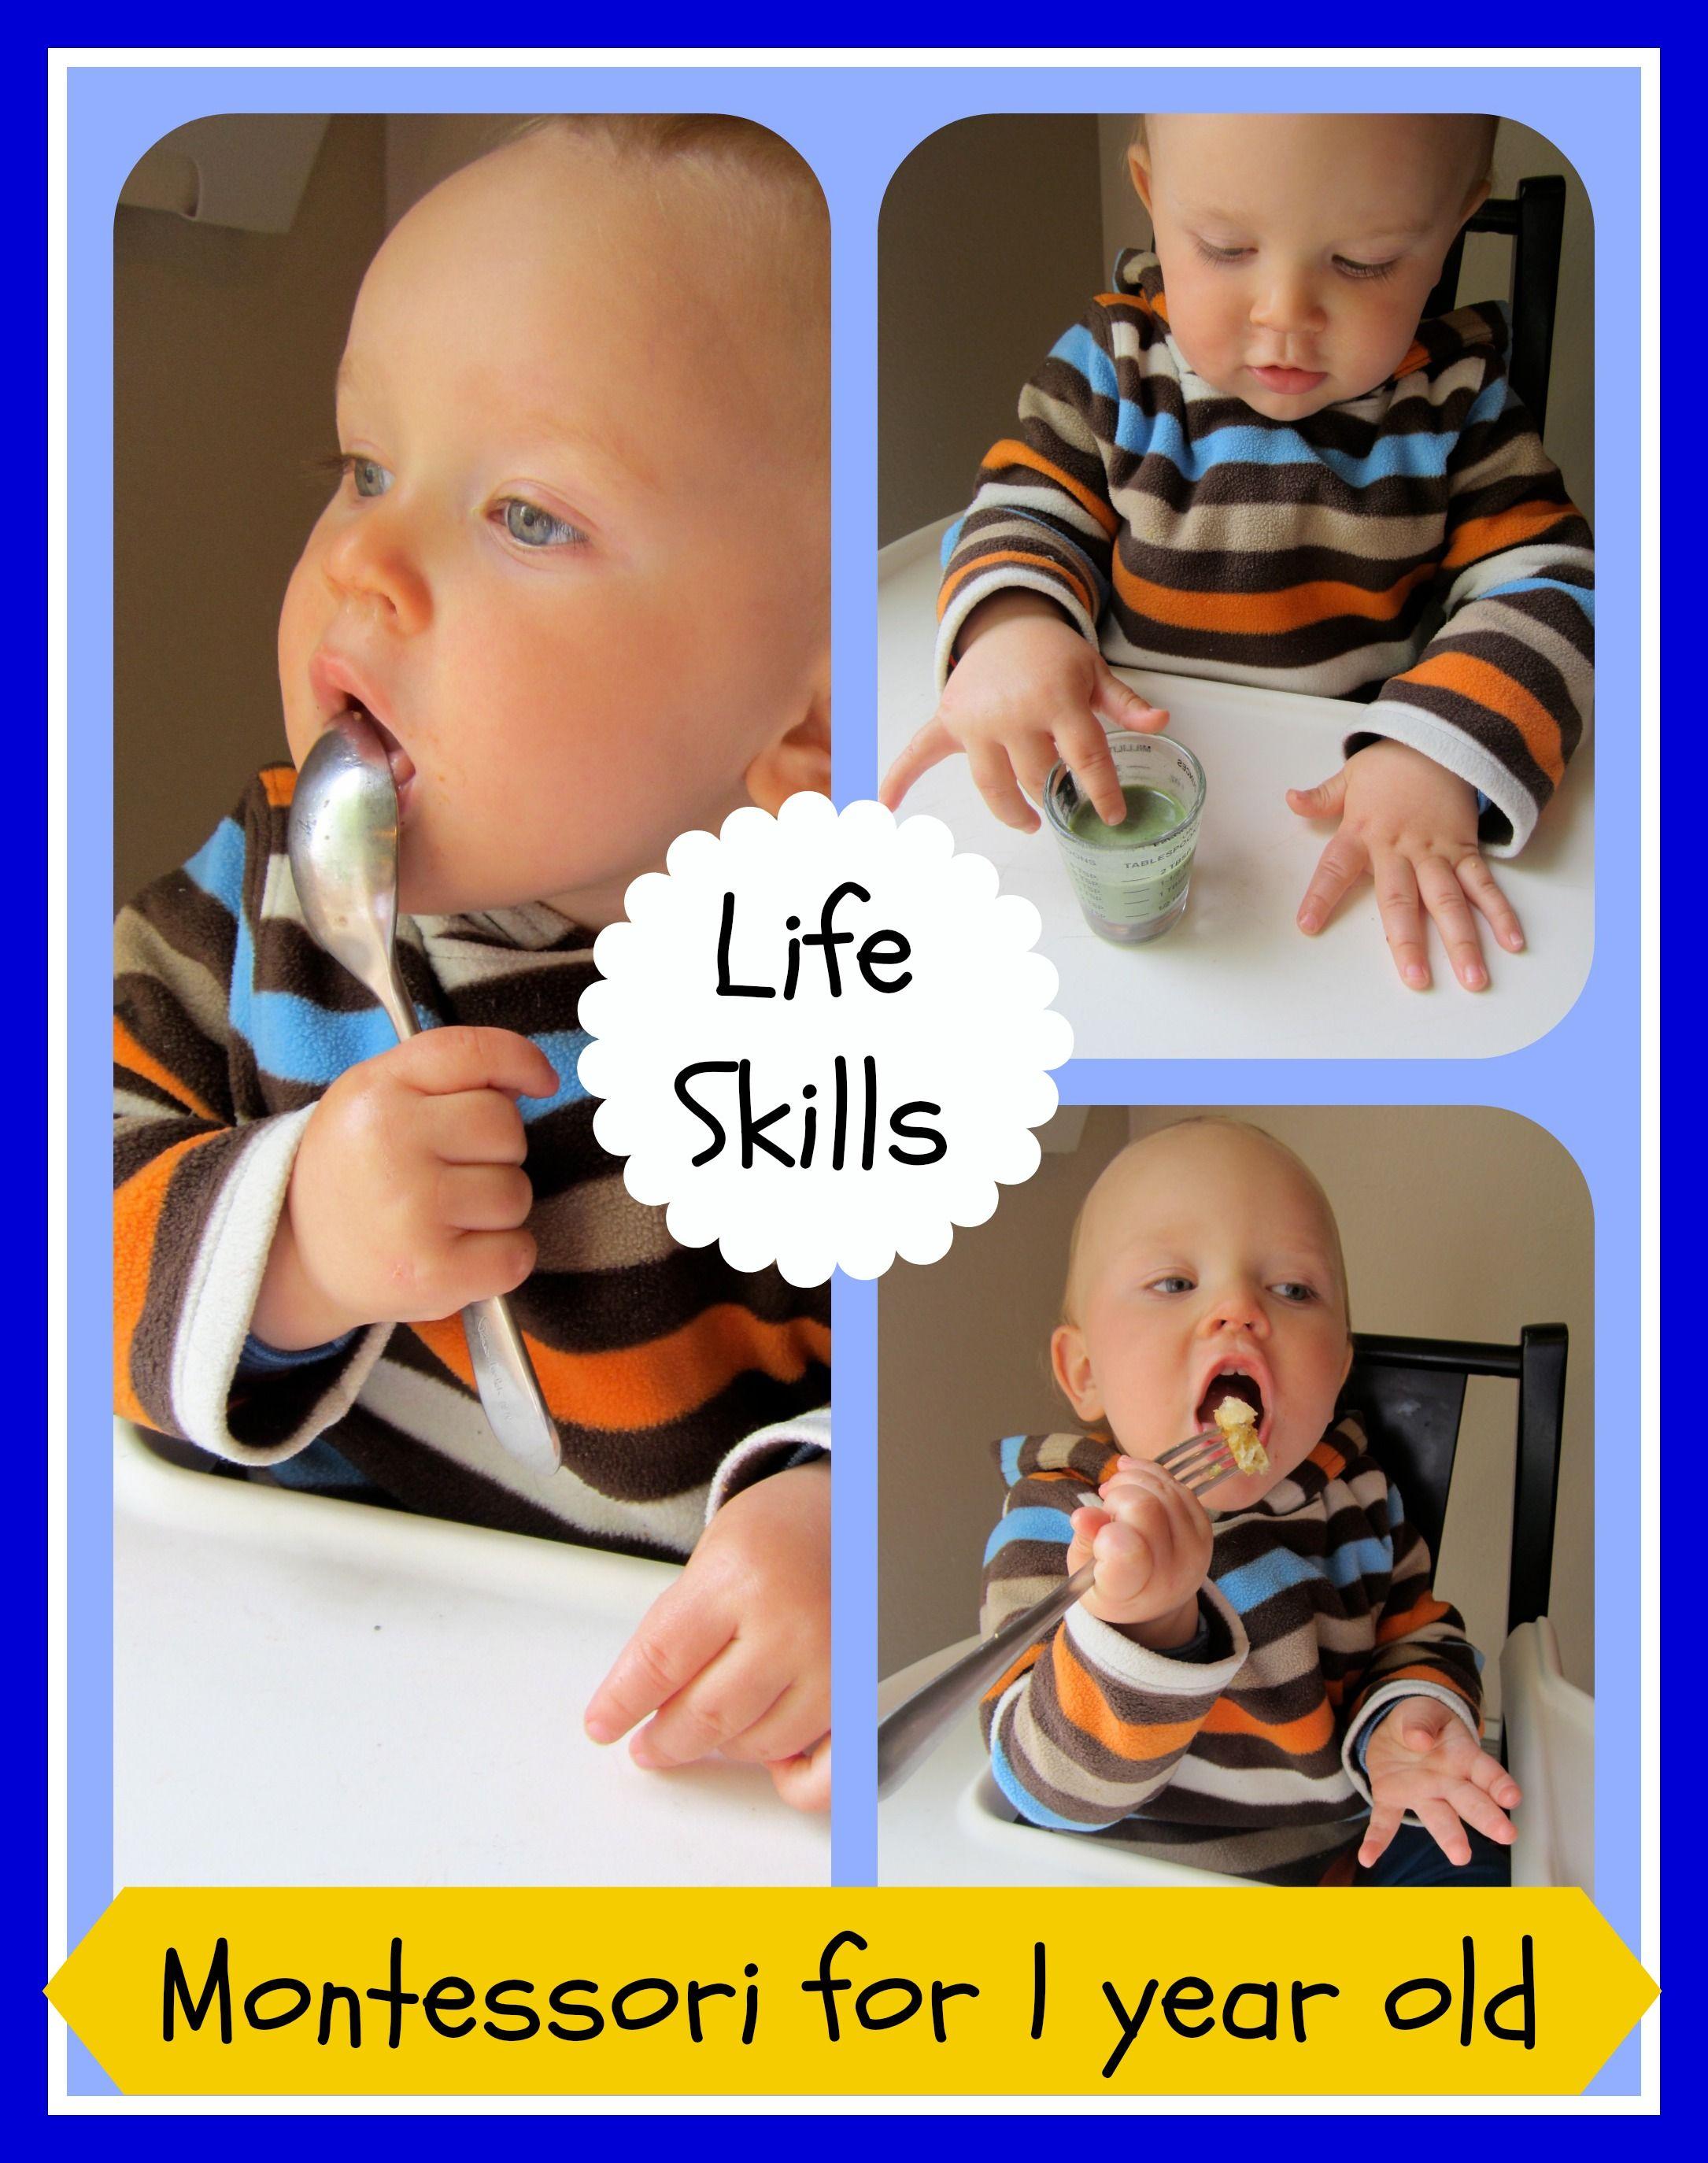 Life Skills for Montessori 1 Year Old contributed by Vanessa on MontessoriBloggersNetwork.com